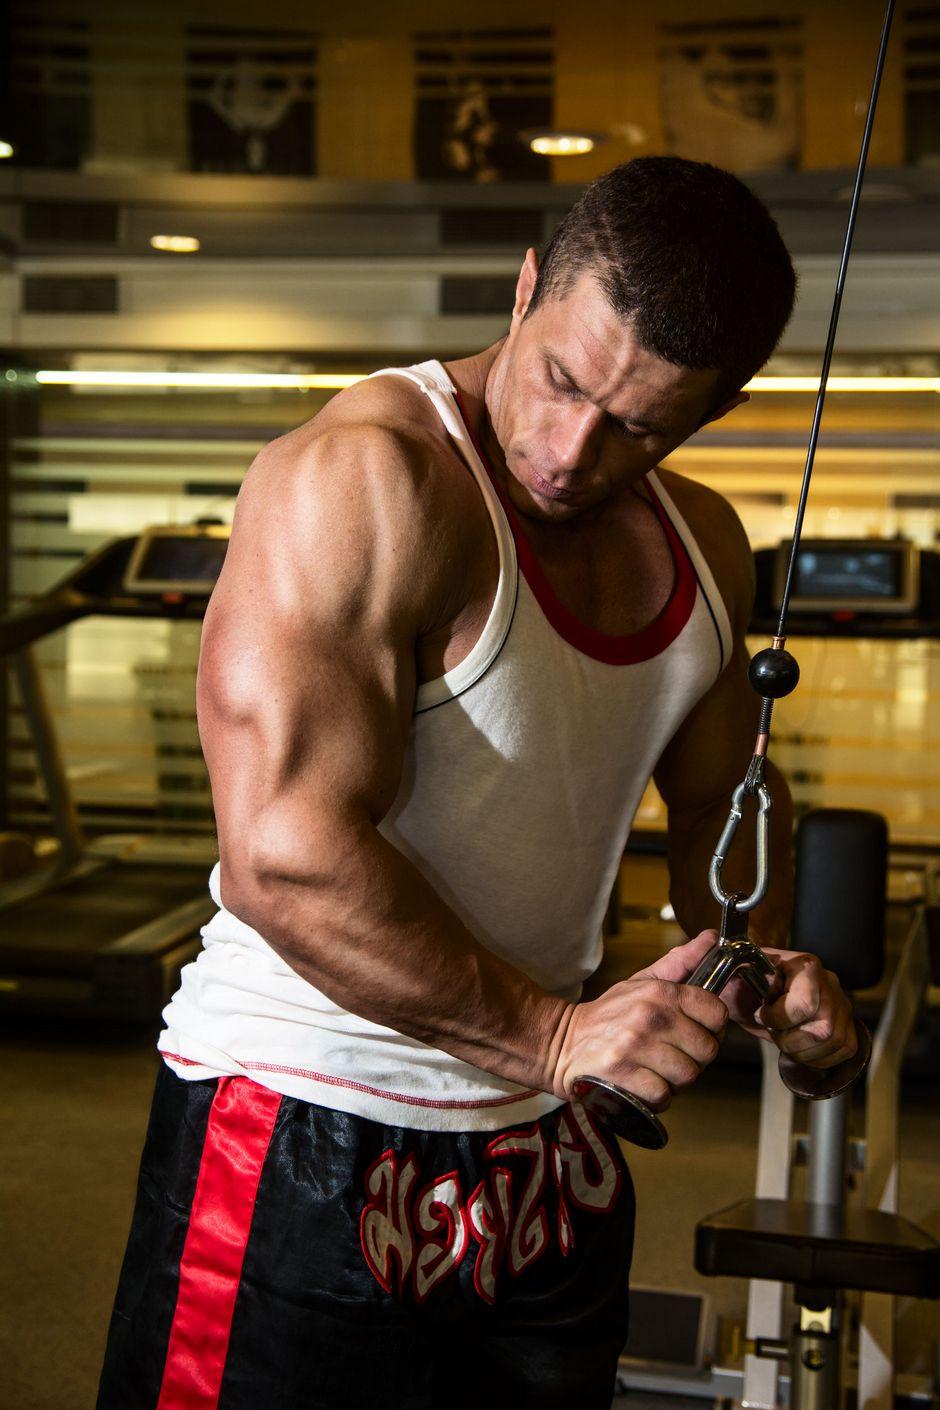 mišićna masa